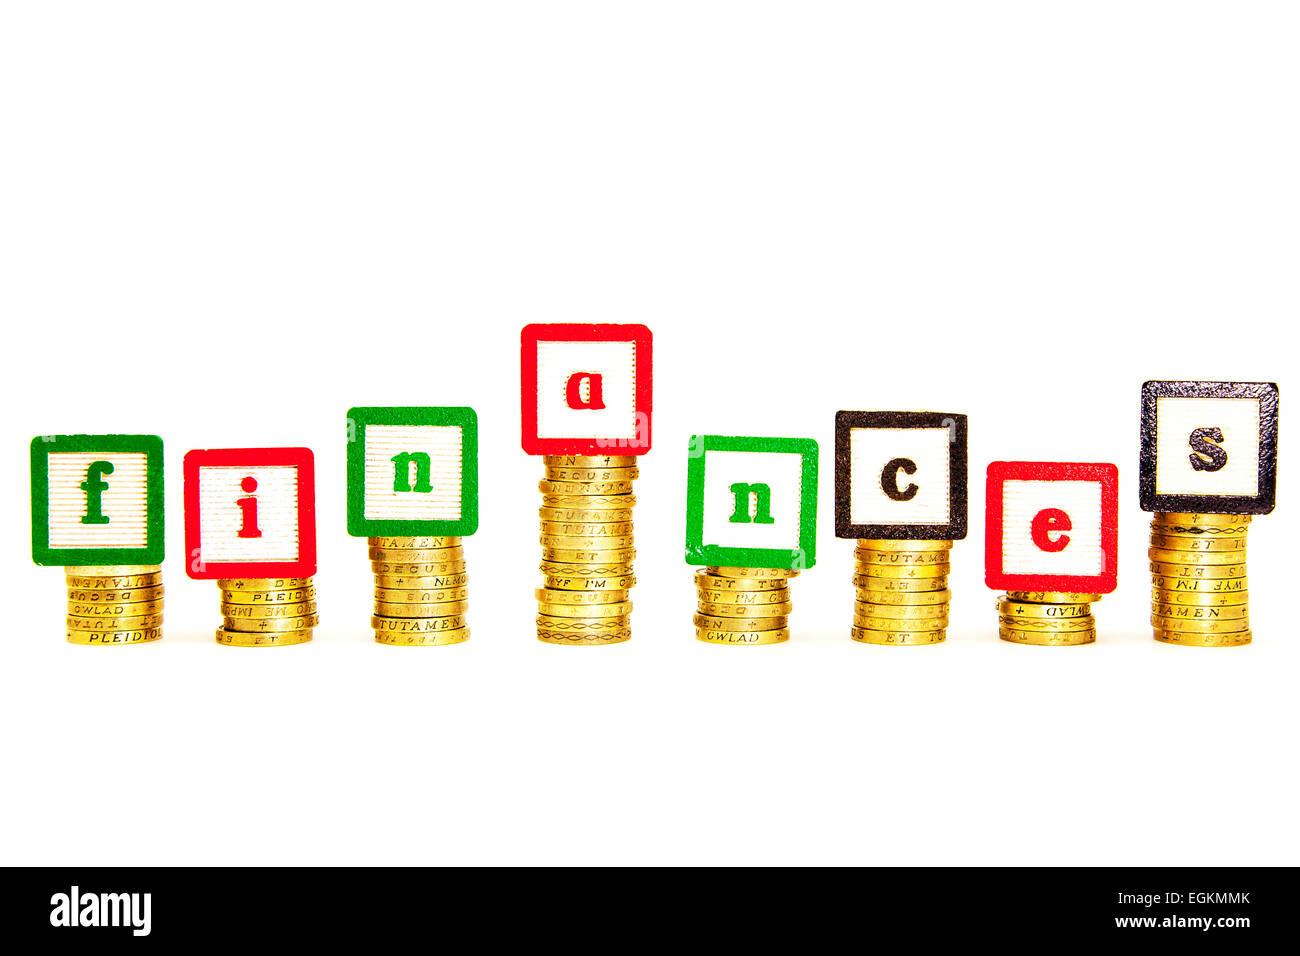 Finances finance money problems cash fund funds financial credit pounds cutout cut out white background copy space - Stock Image